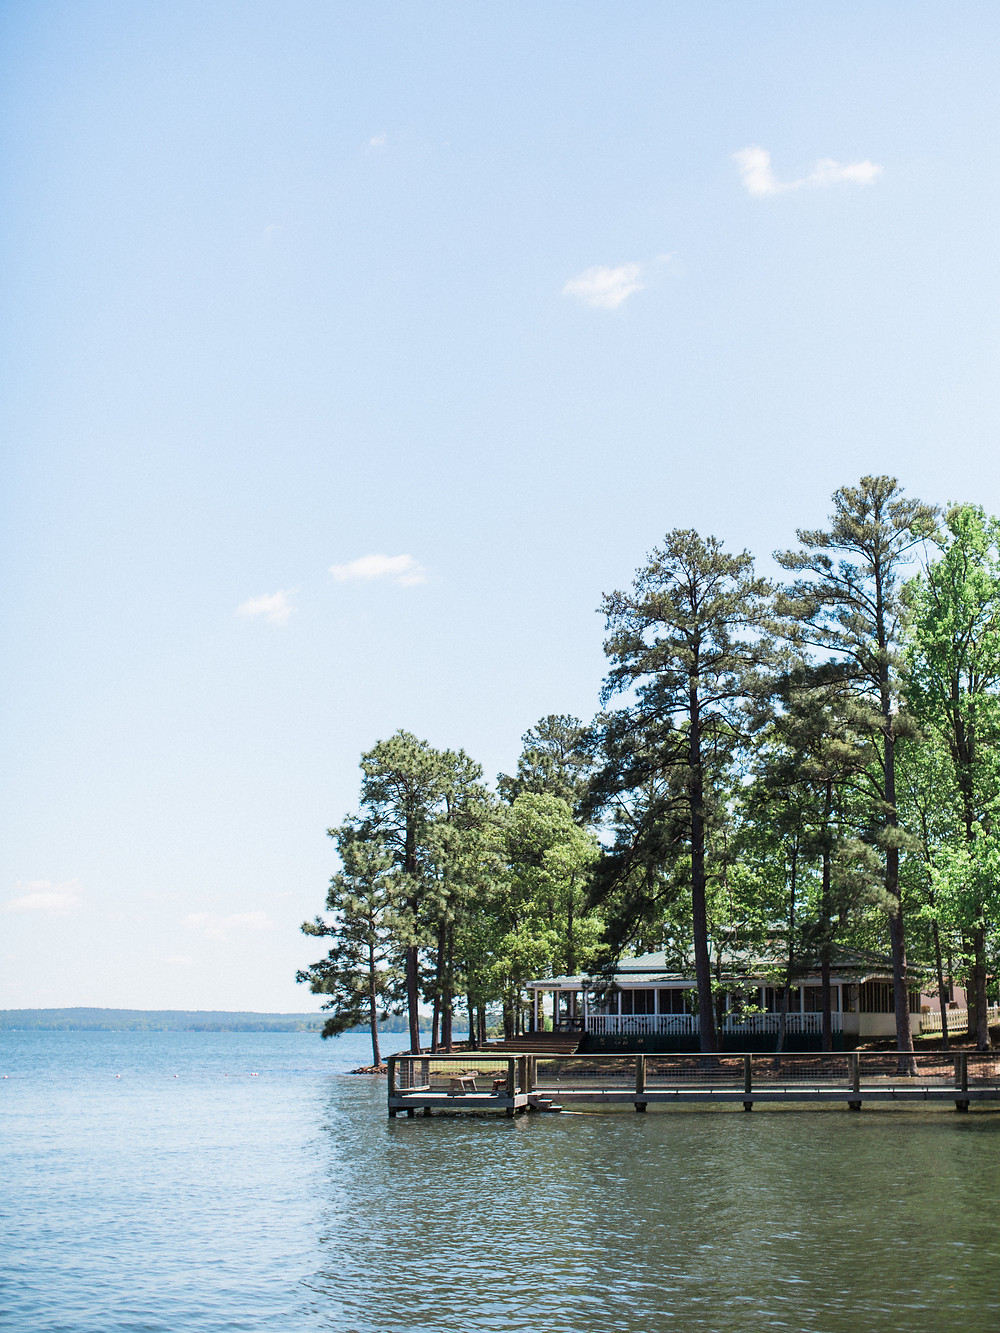 wedding venue, lake martin, al